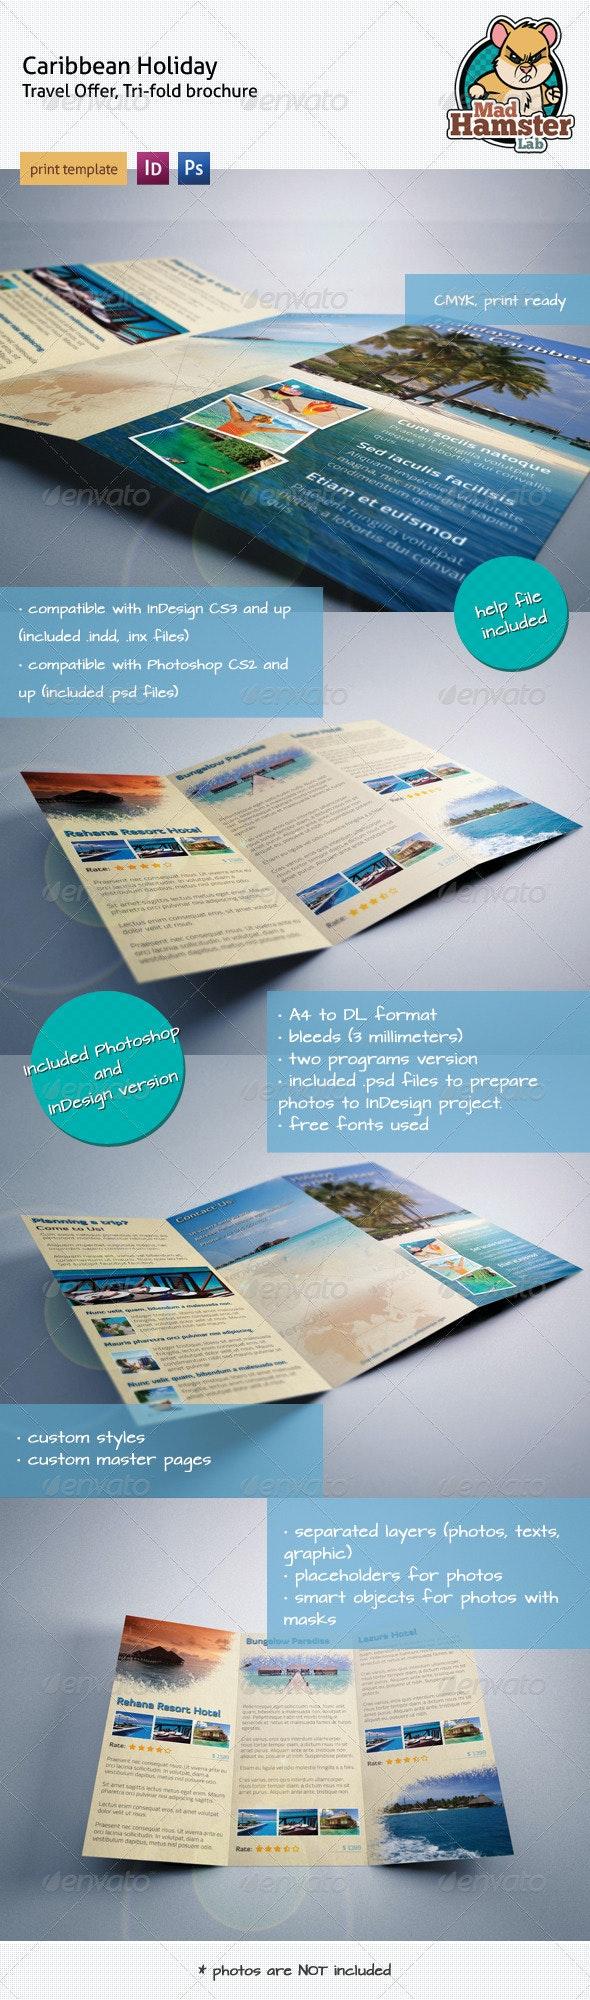 Caribbean Holiday, Travel Offer, Tri-fold Brochure - Brochures Print Templates